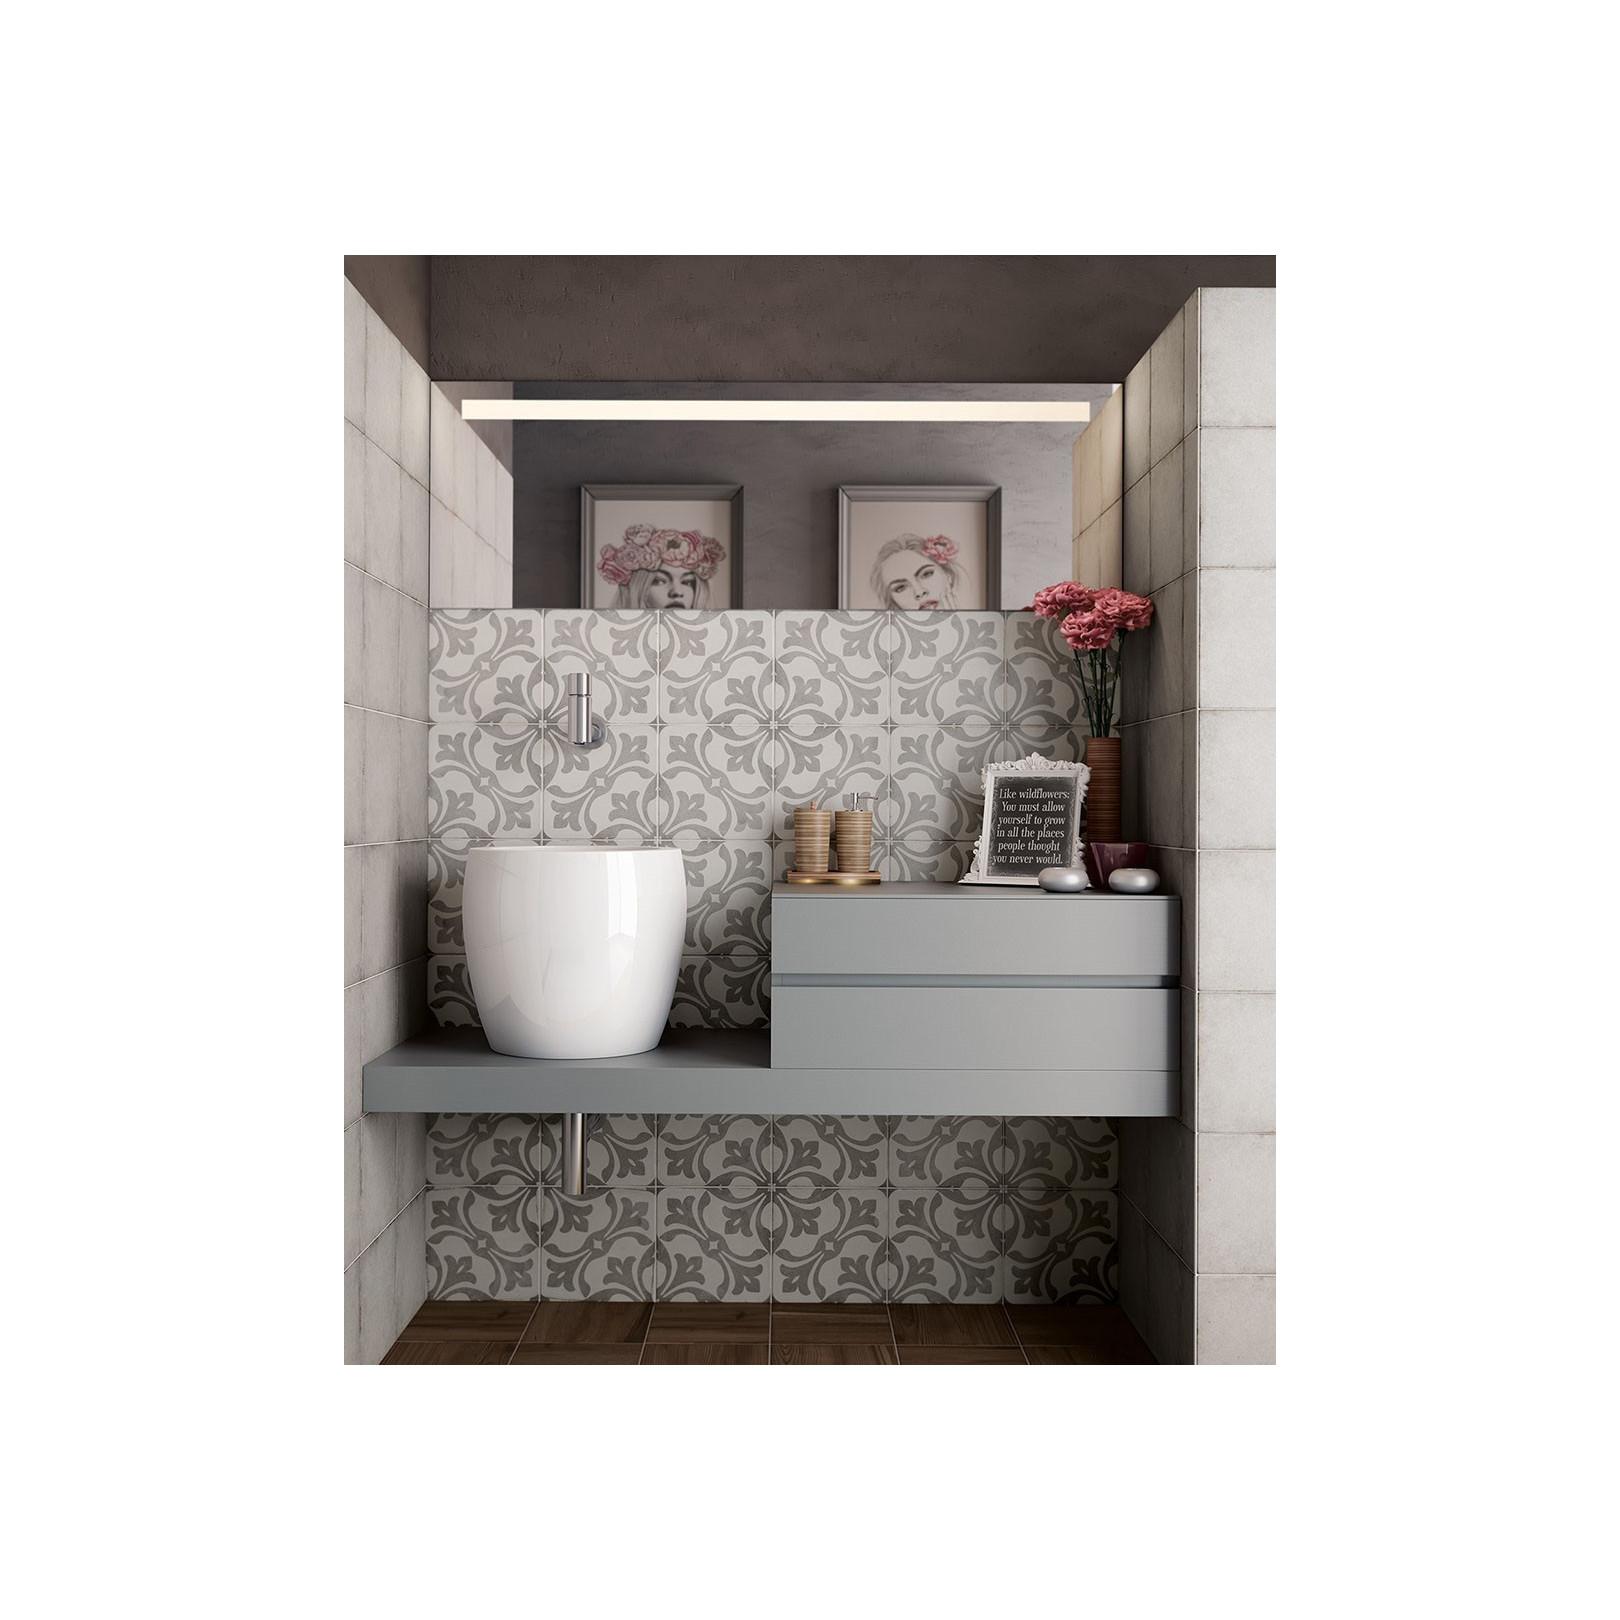 carrelage gres cerame effet carreau ciment art nouveau grey la rambla 20x20cm casalux home design